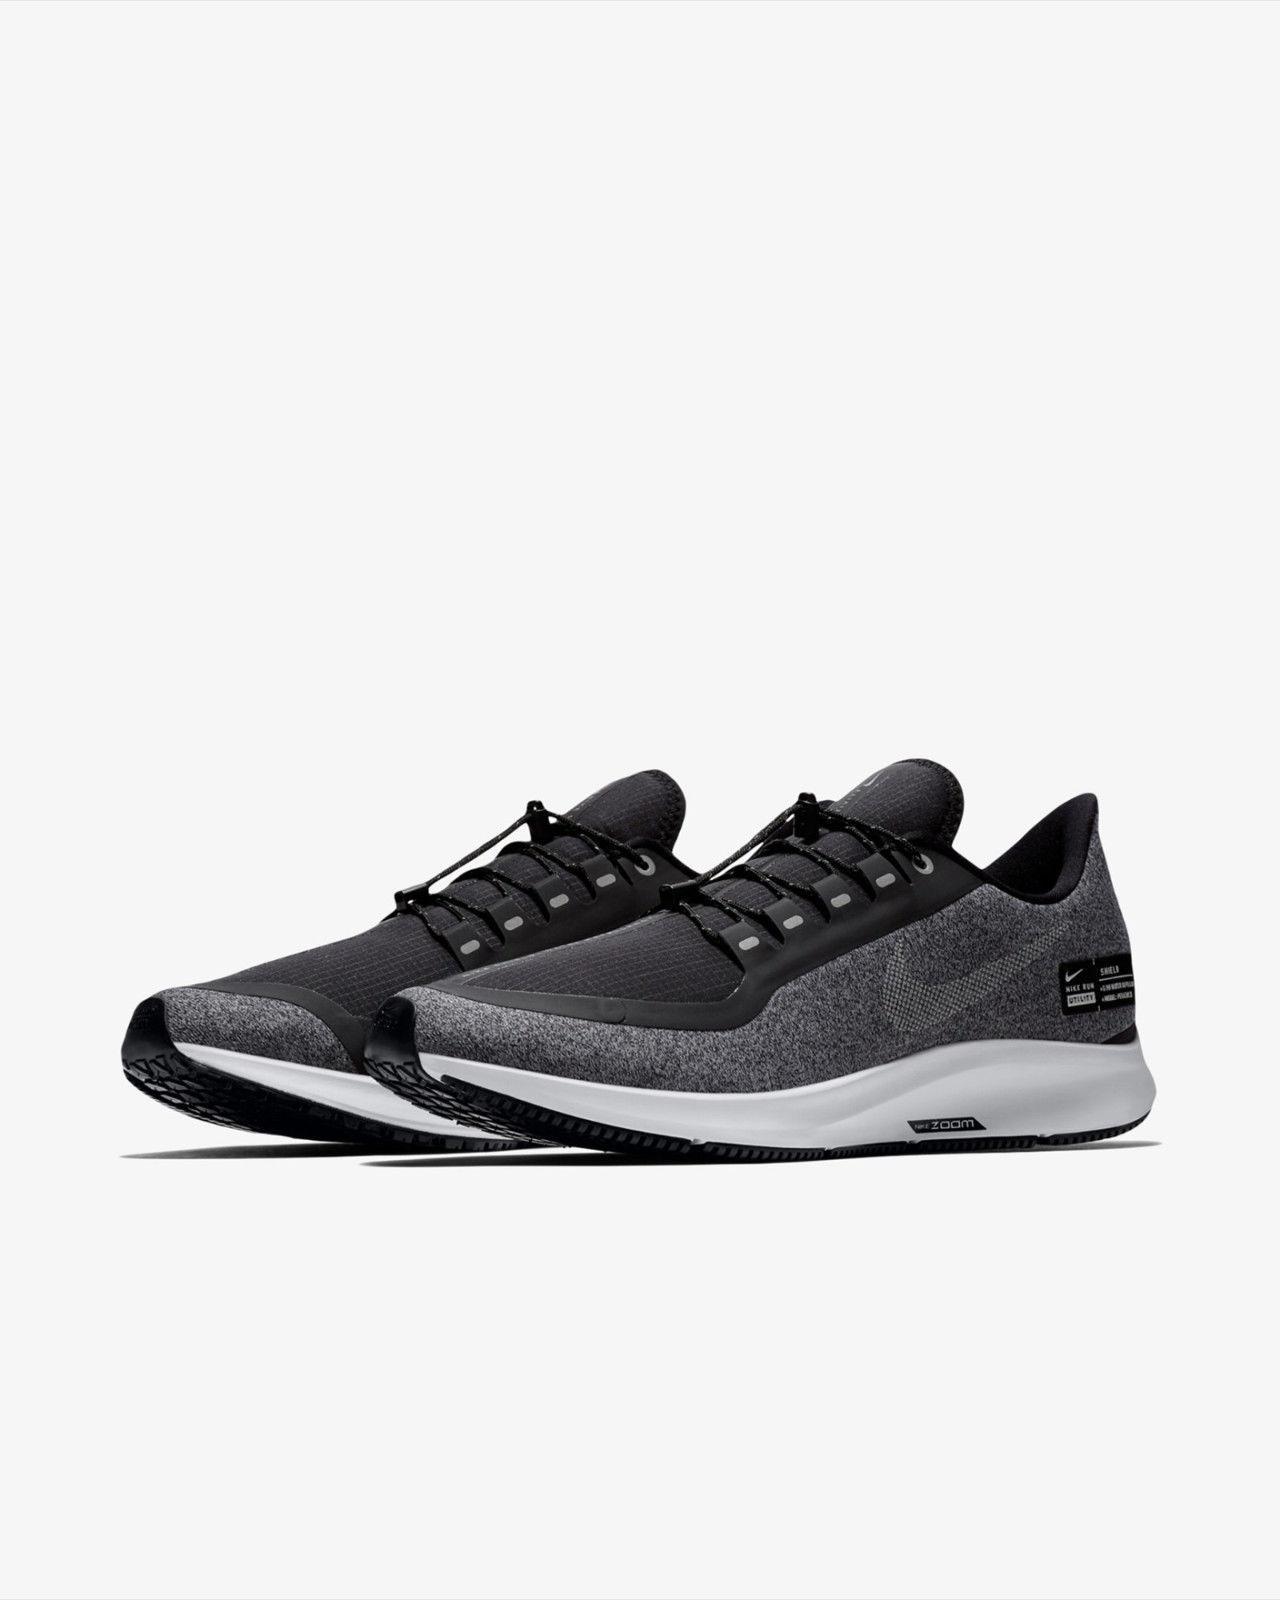 57c24c9e8b2 57. 57. Previous. Nike Air Zoom Pegasus 35 Shield Water-Repellent AA1643-001  Mens Running Shoes · Nike Air Zoom ...